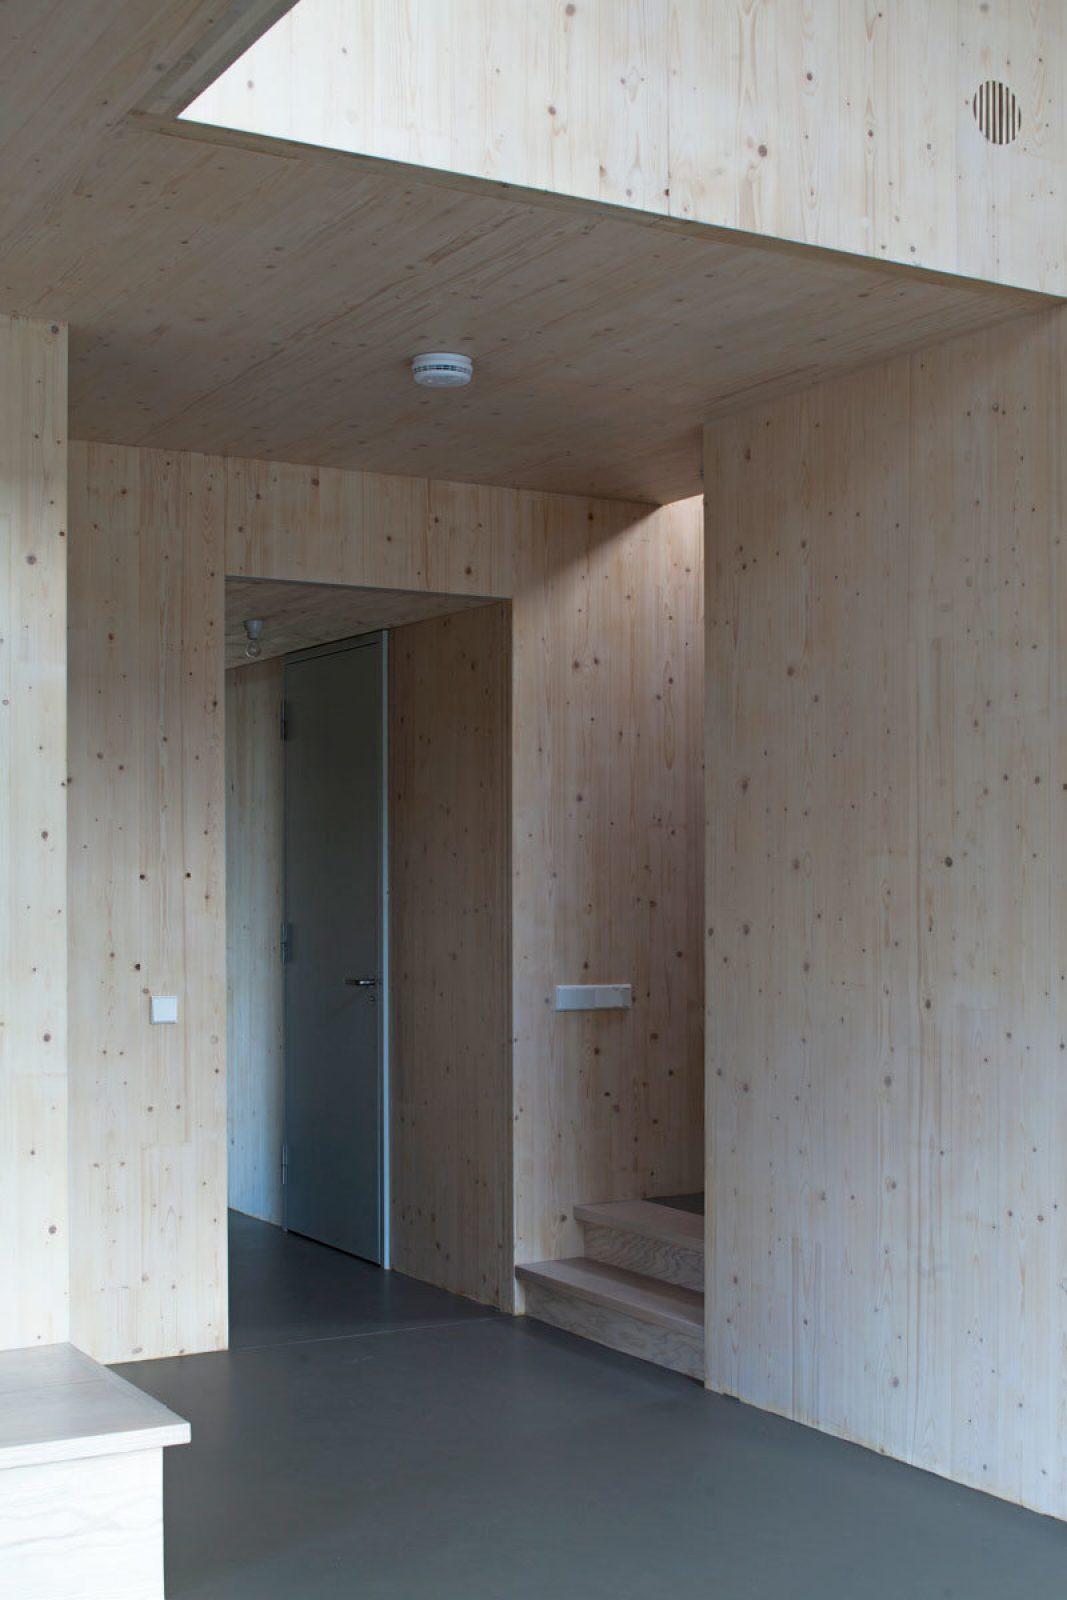 Goeree Hallway